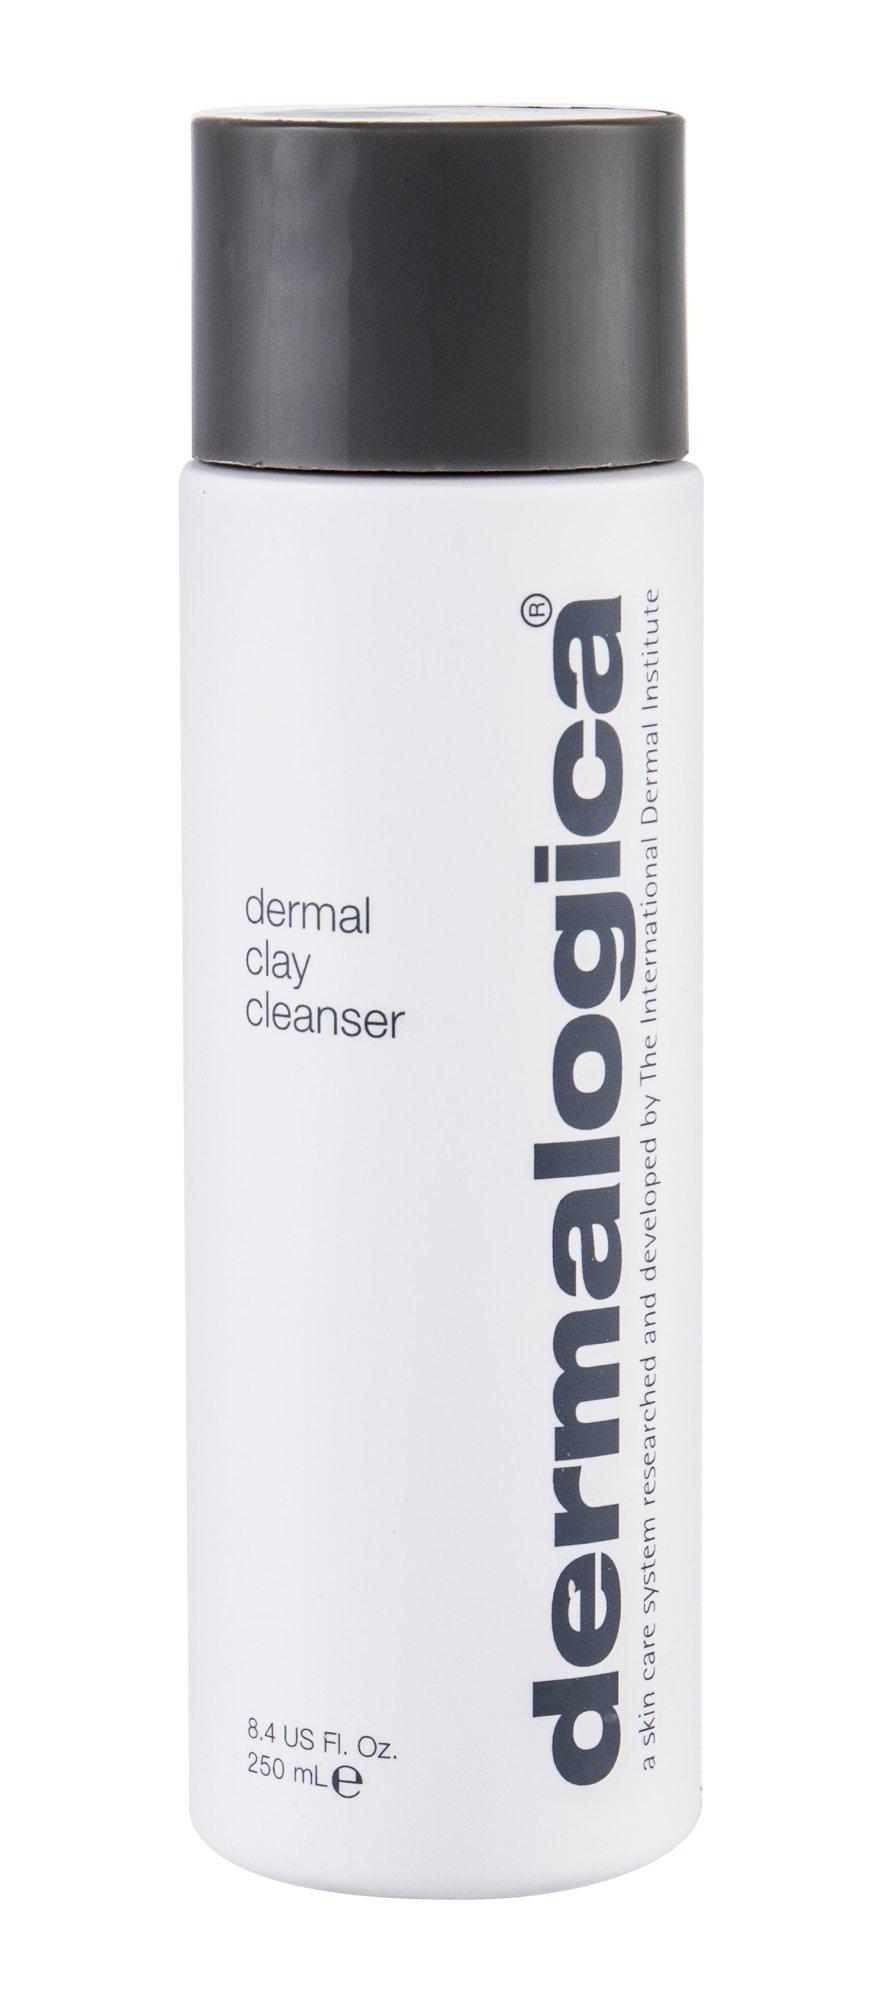 Dermalogica Daily Skin Health Cleansing Emulsion 250ml  Dermal Clay Cleanser